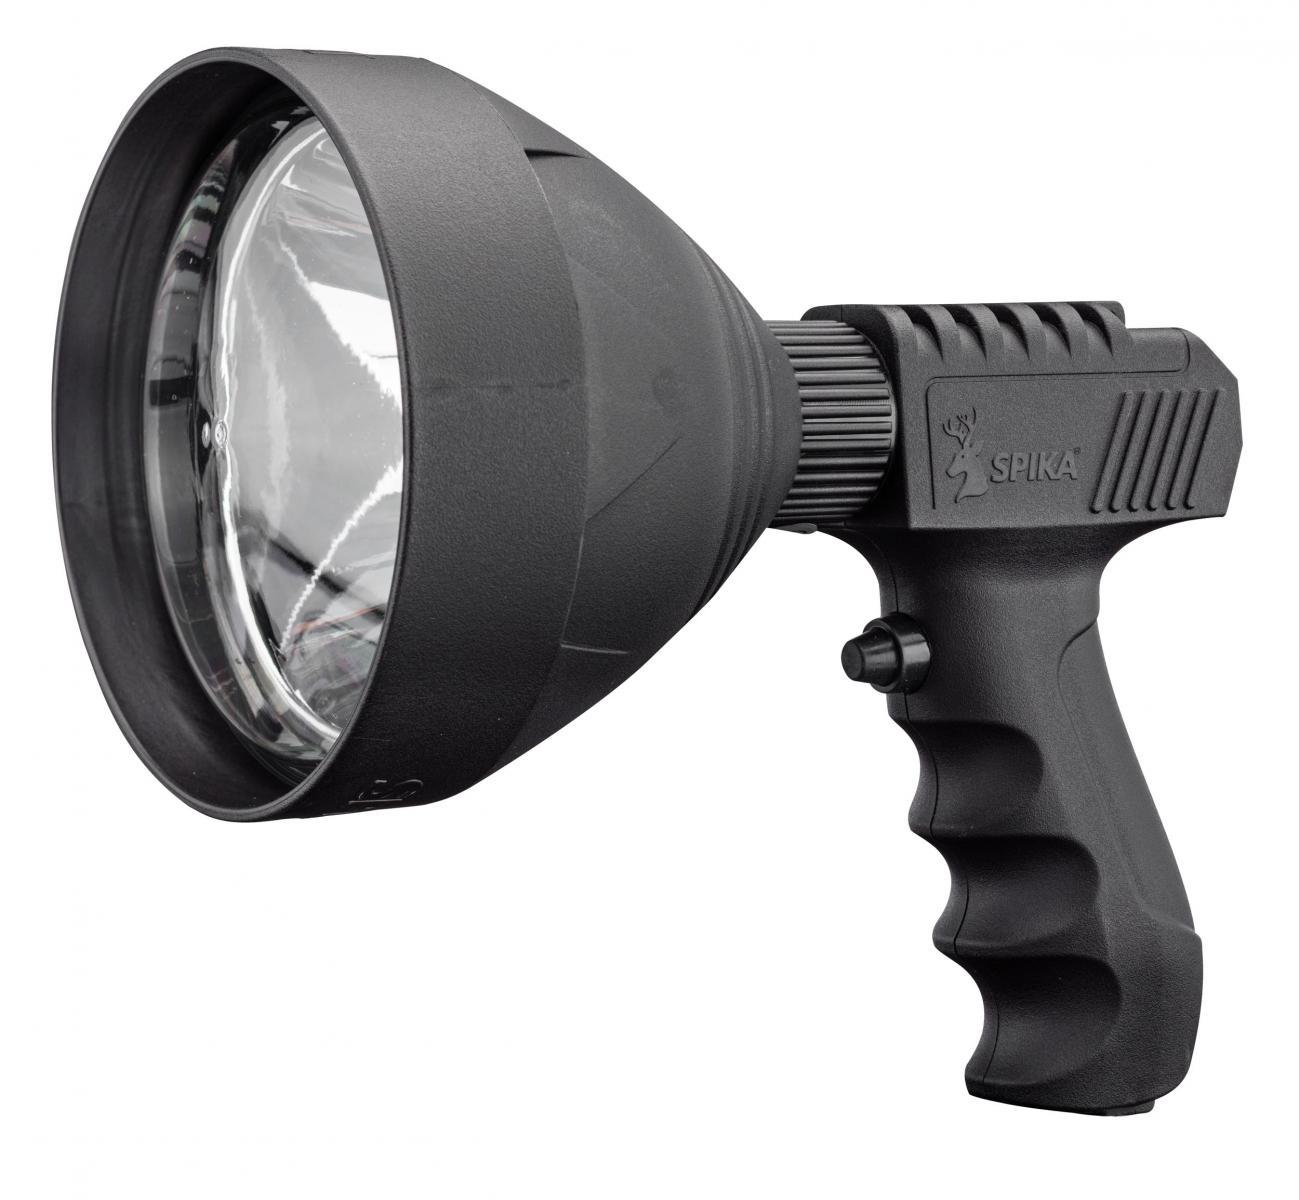 Lampe / Spot SPIKA 1200 Lumens 15 W